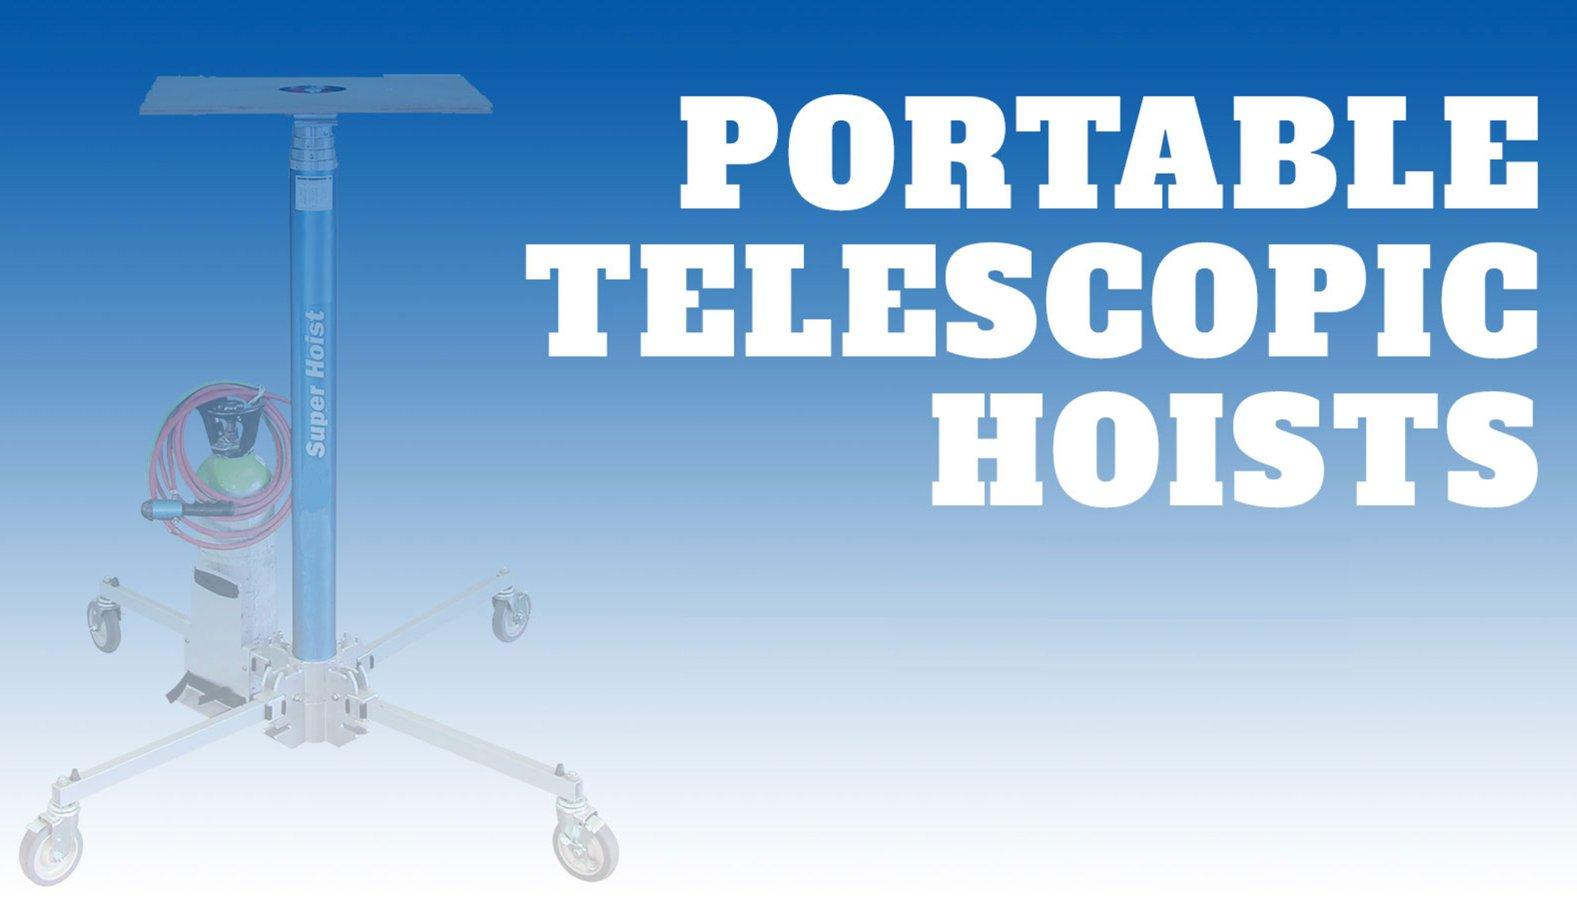 Portable-Telepscopic-Hoist